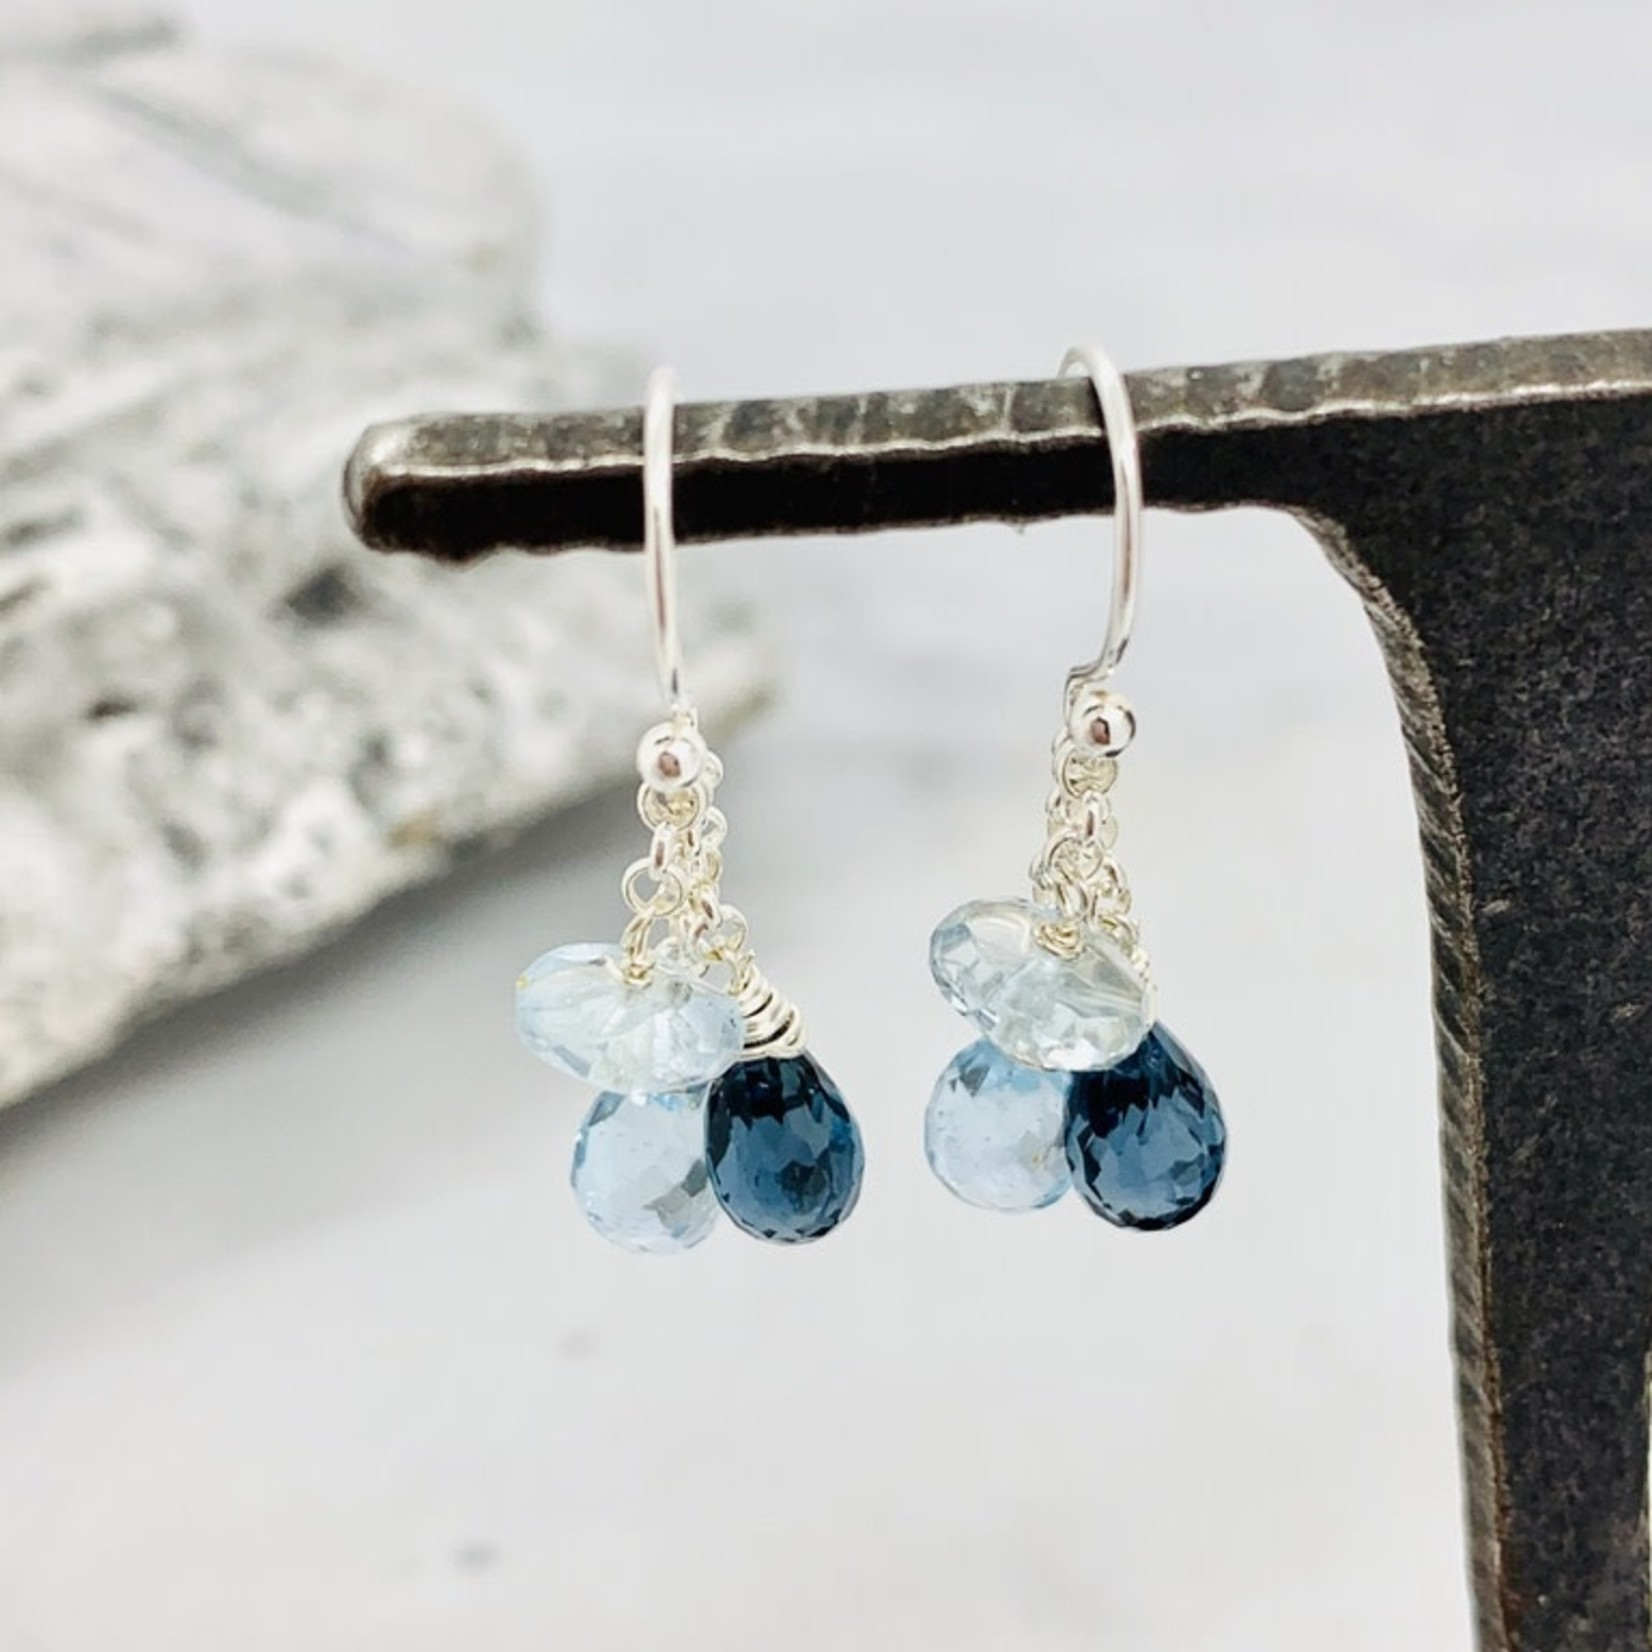 Handmade earrings with sky blue topaz disc, london blue topaz briolette, sky blue topaz briolette